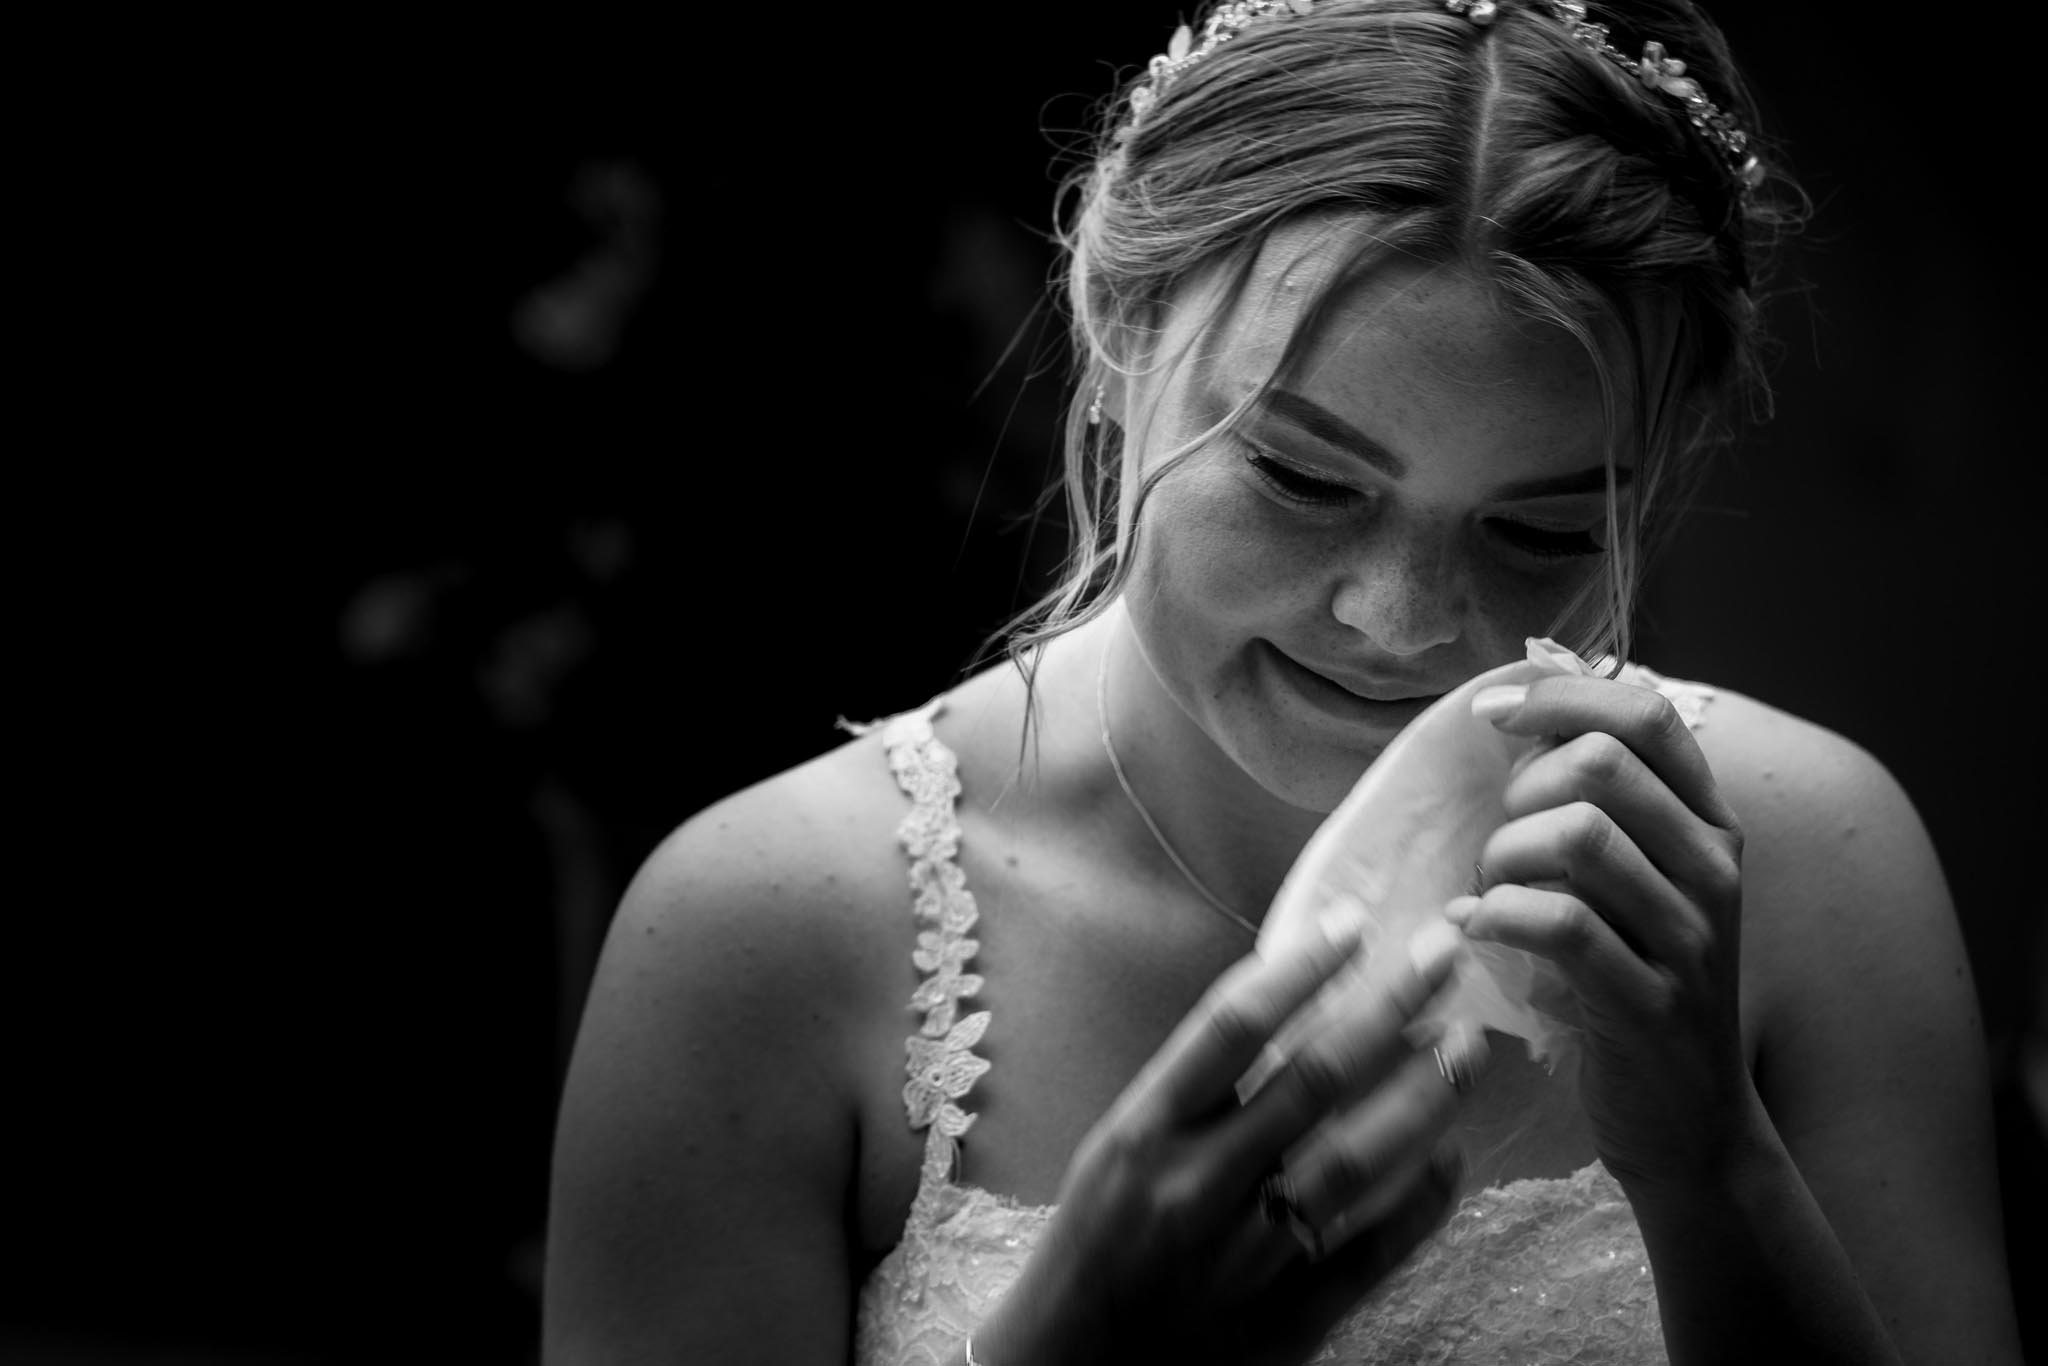 397-Ceremony-Luke-Yasmin-The-Rayleigh-Club-Wedding-Photography.jpg